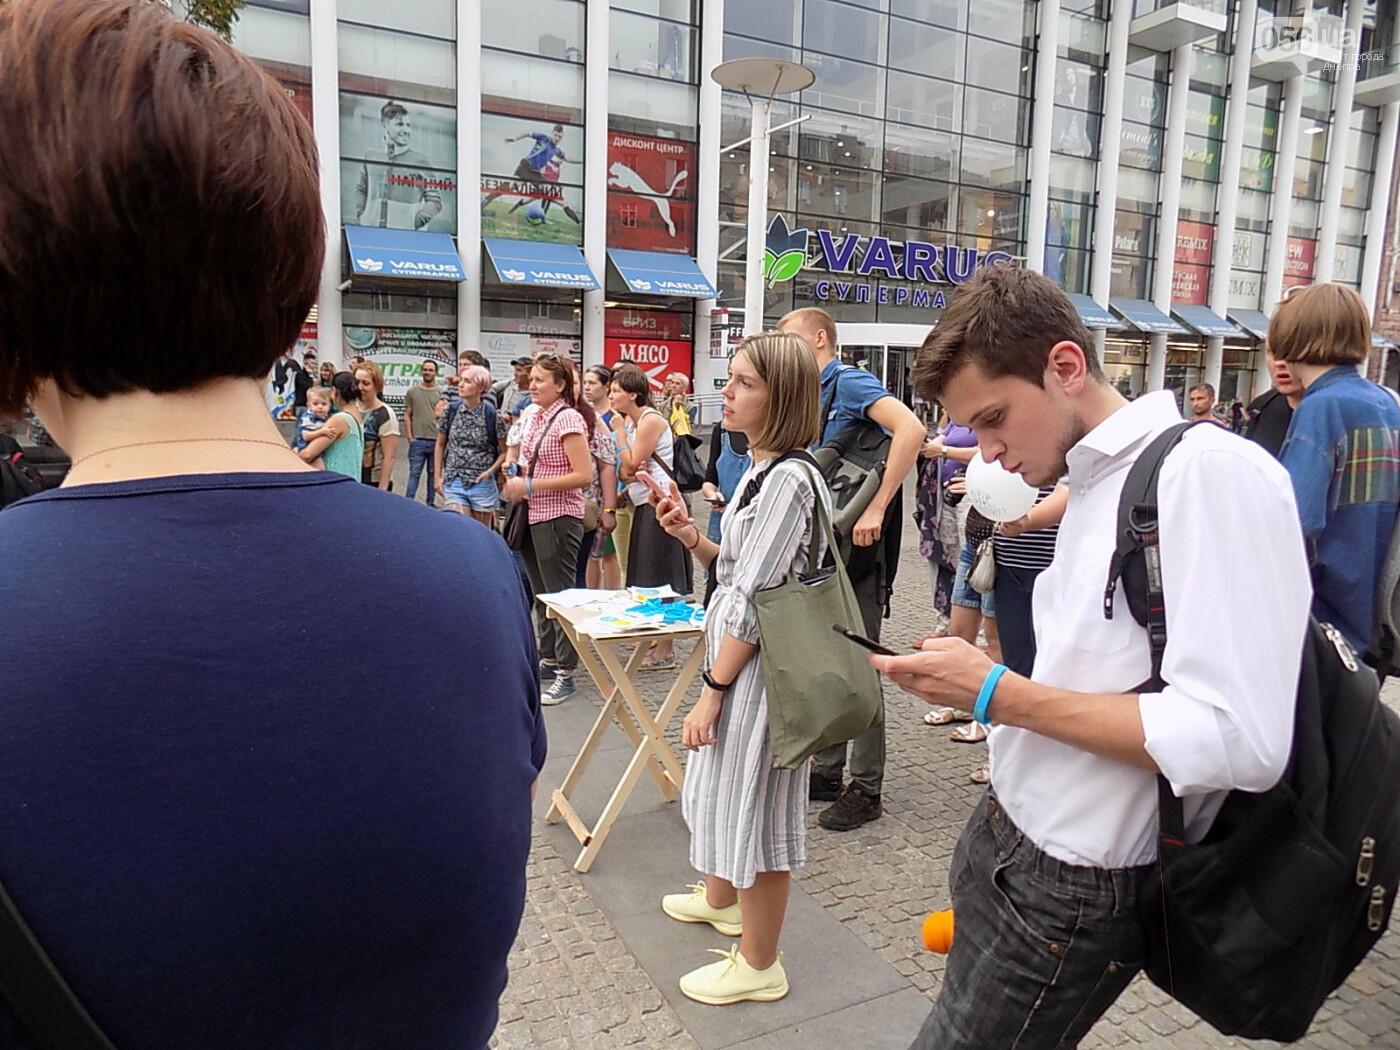 """Мова єднає Дніпро"": в центре города прошла символическая акция с концертом и подарками, - ФОТО, фото-10"